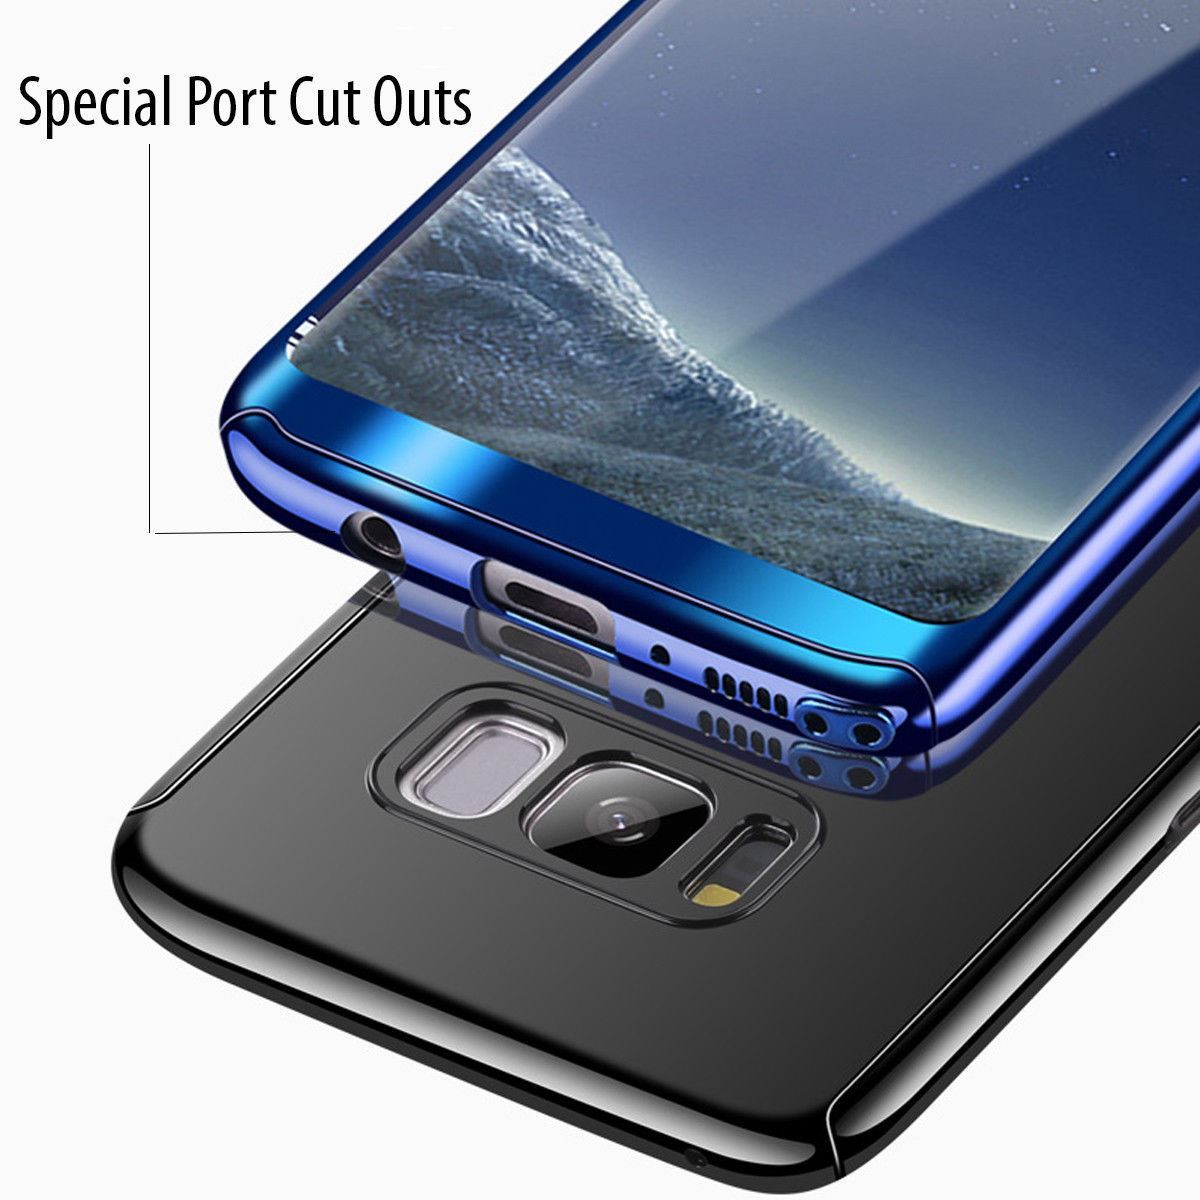 Shockproof-Hybrid-360-Ultra-Thin-Mirror-Hard-Case-Samsung-Galaxy-S7-edge-S8-S9 thumbnail 37